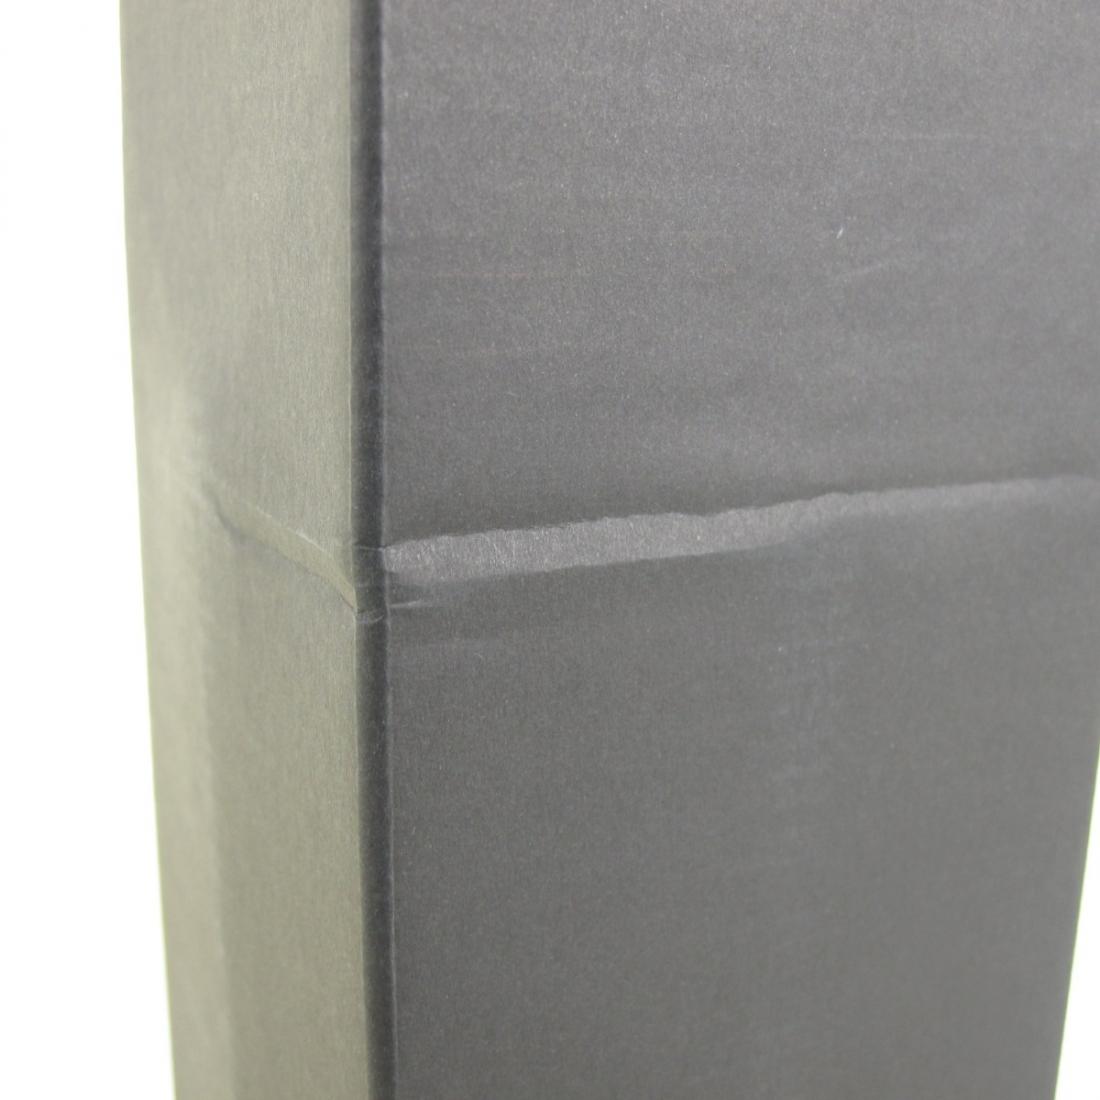 Chichibu 2011 Peated Single Cask #1404 / Modern Malt Whisky Market